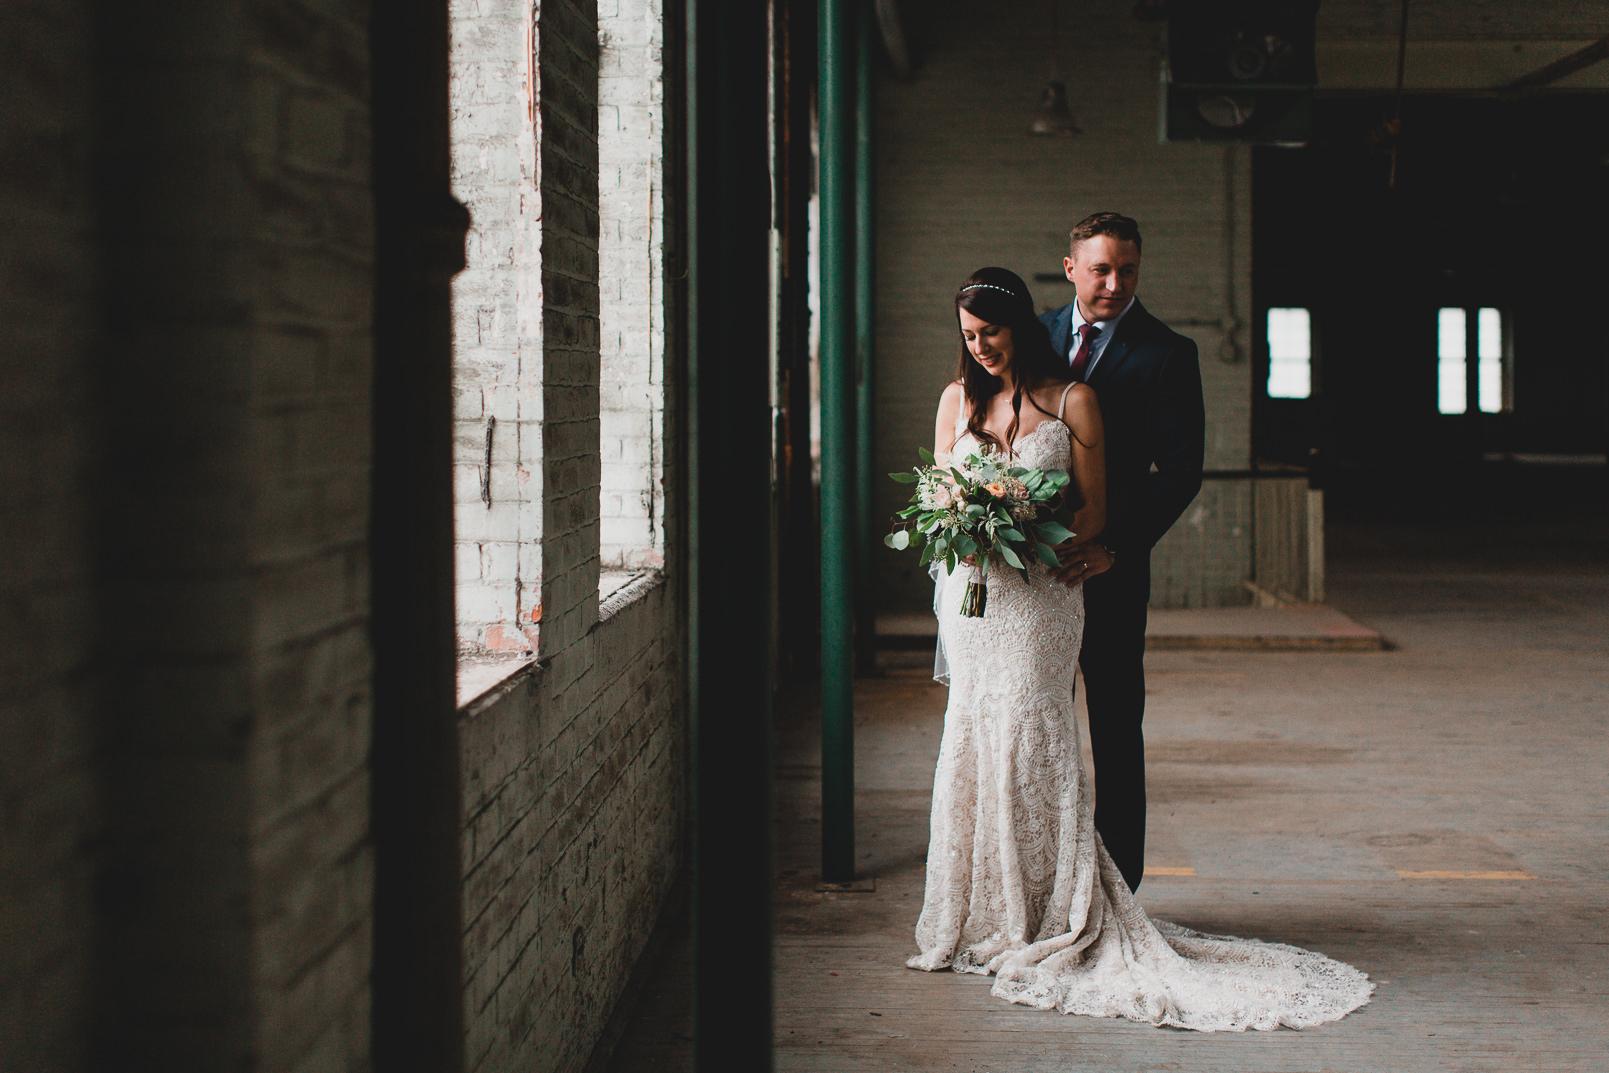 047-Jonathan-Kuhn-Photography-Wedding-_mini.jpg